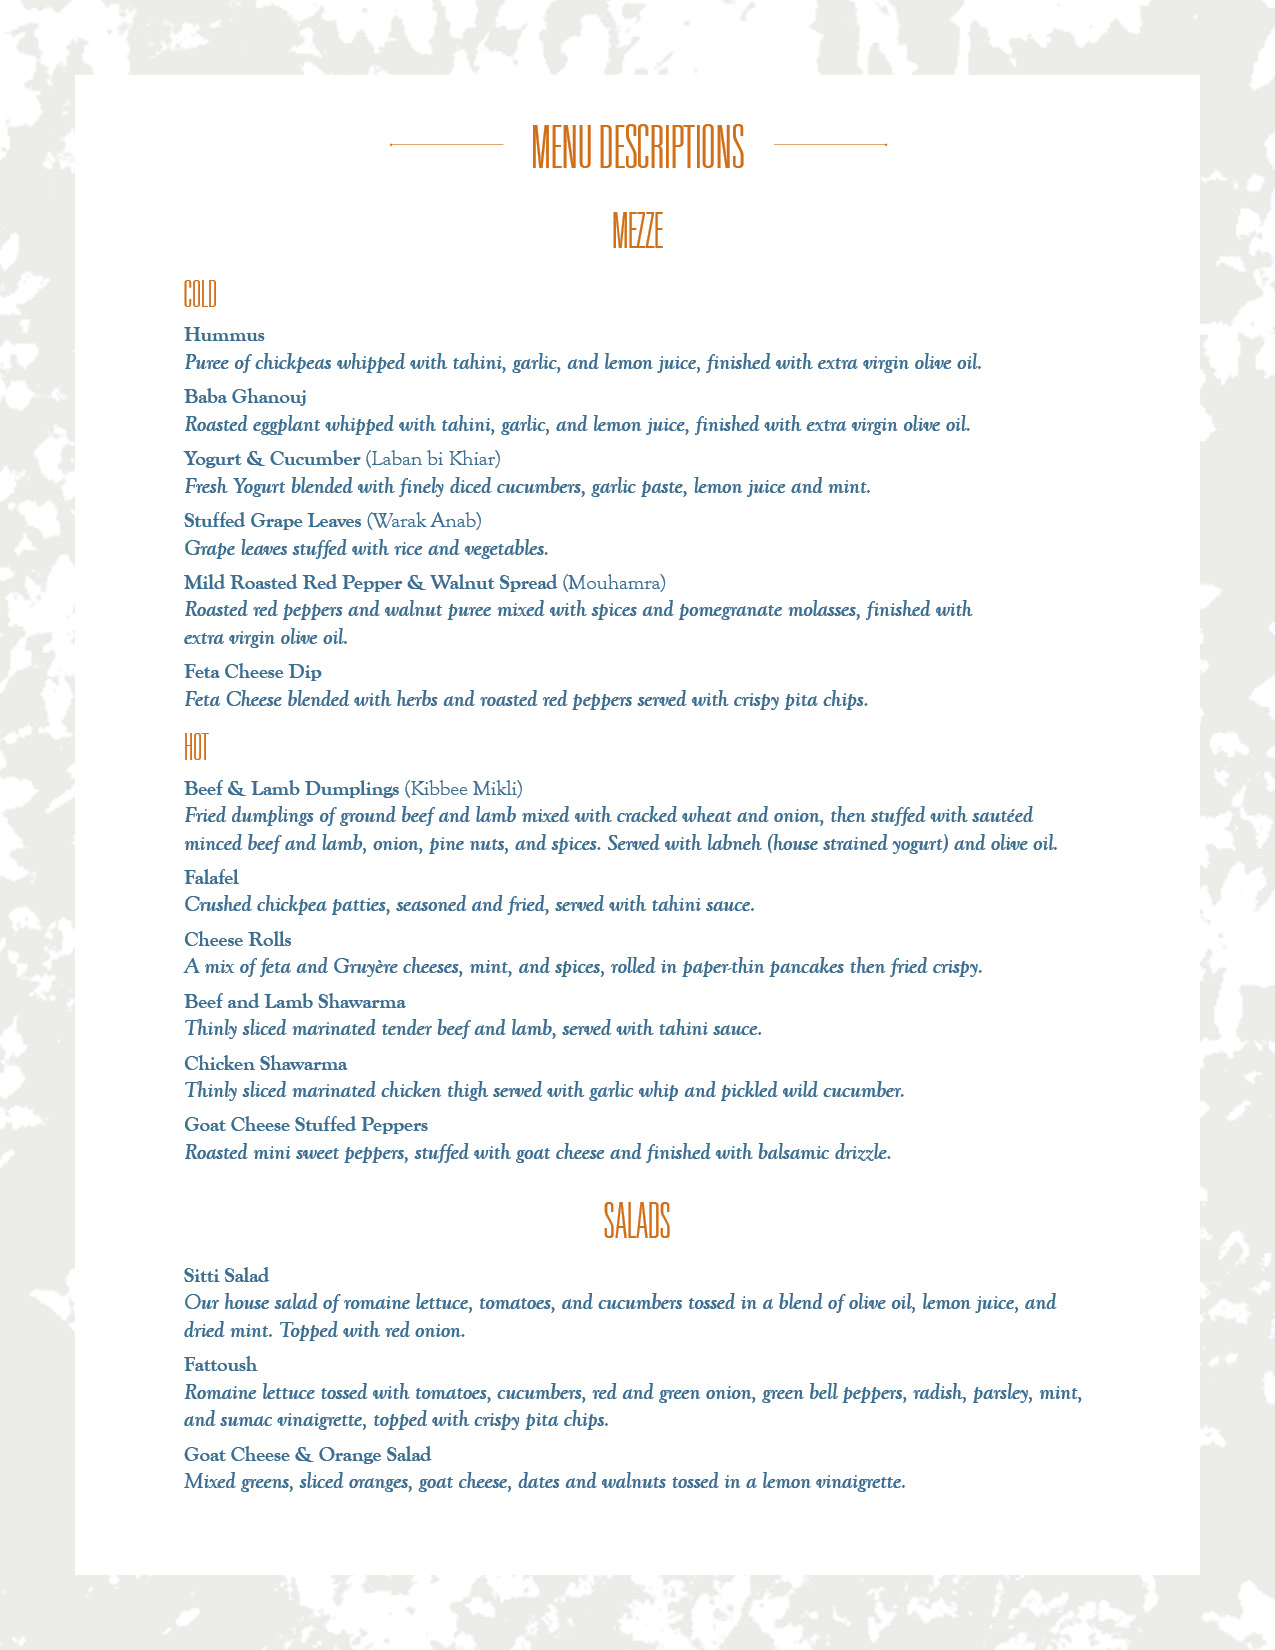 sitti menu descriptions 1